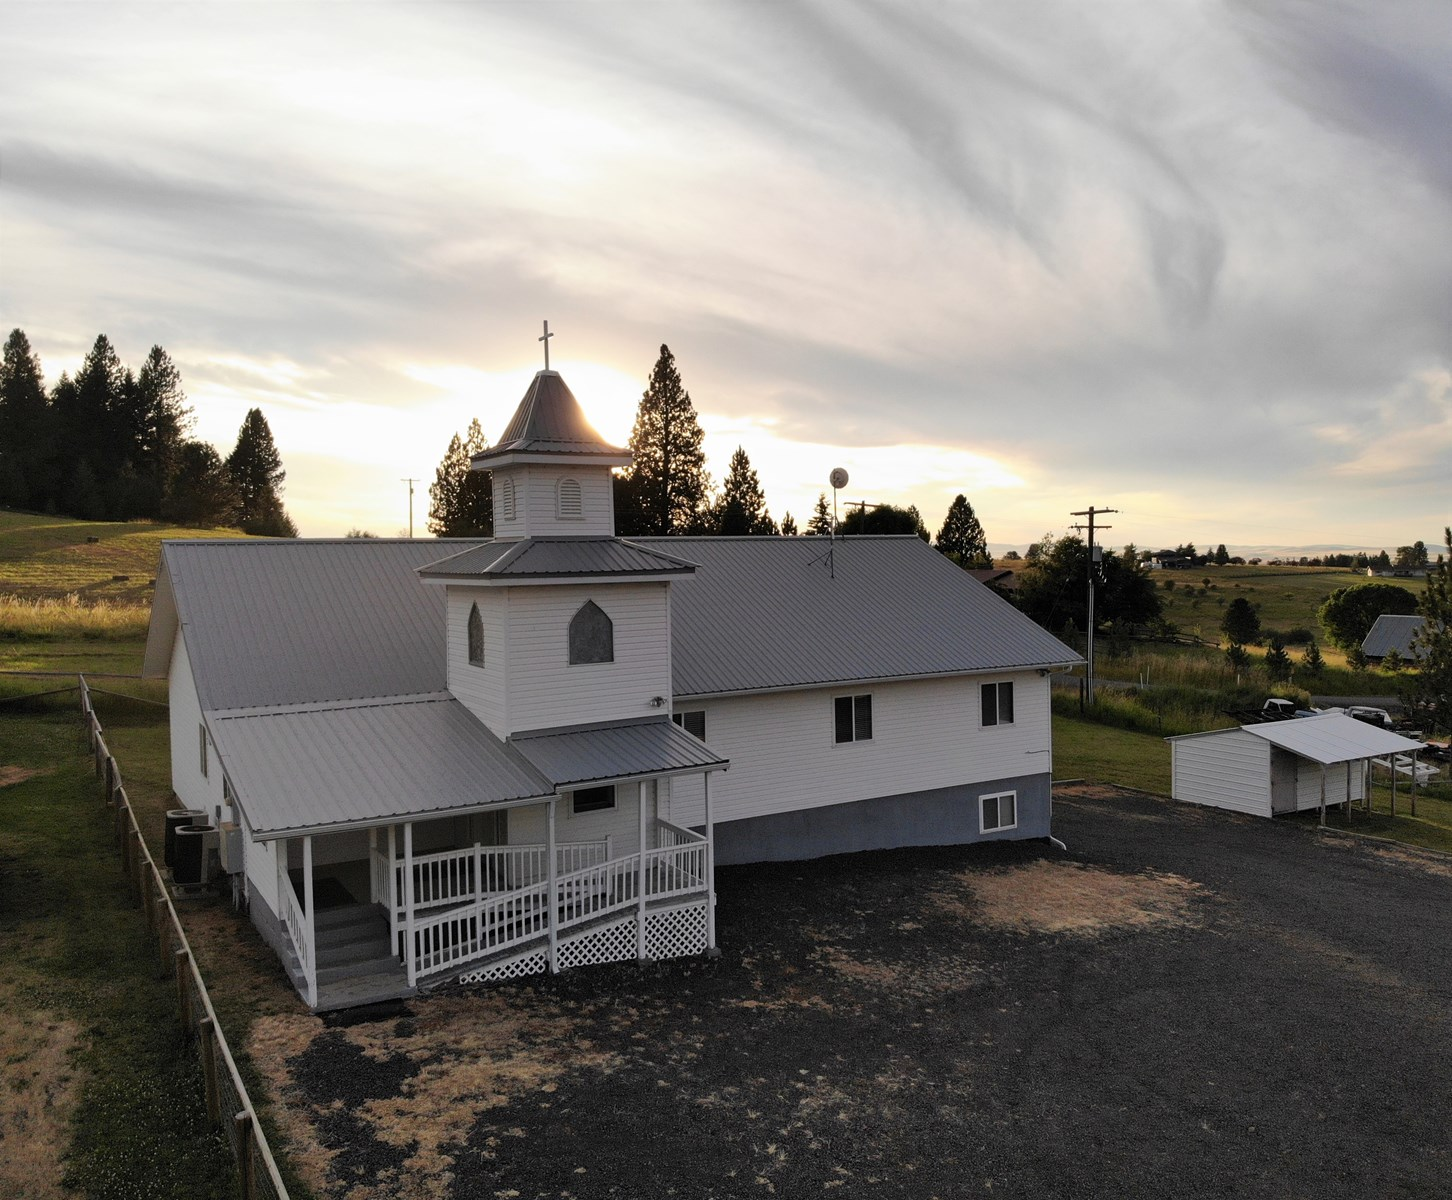 Former Mt. Idaho Baptist Church